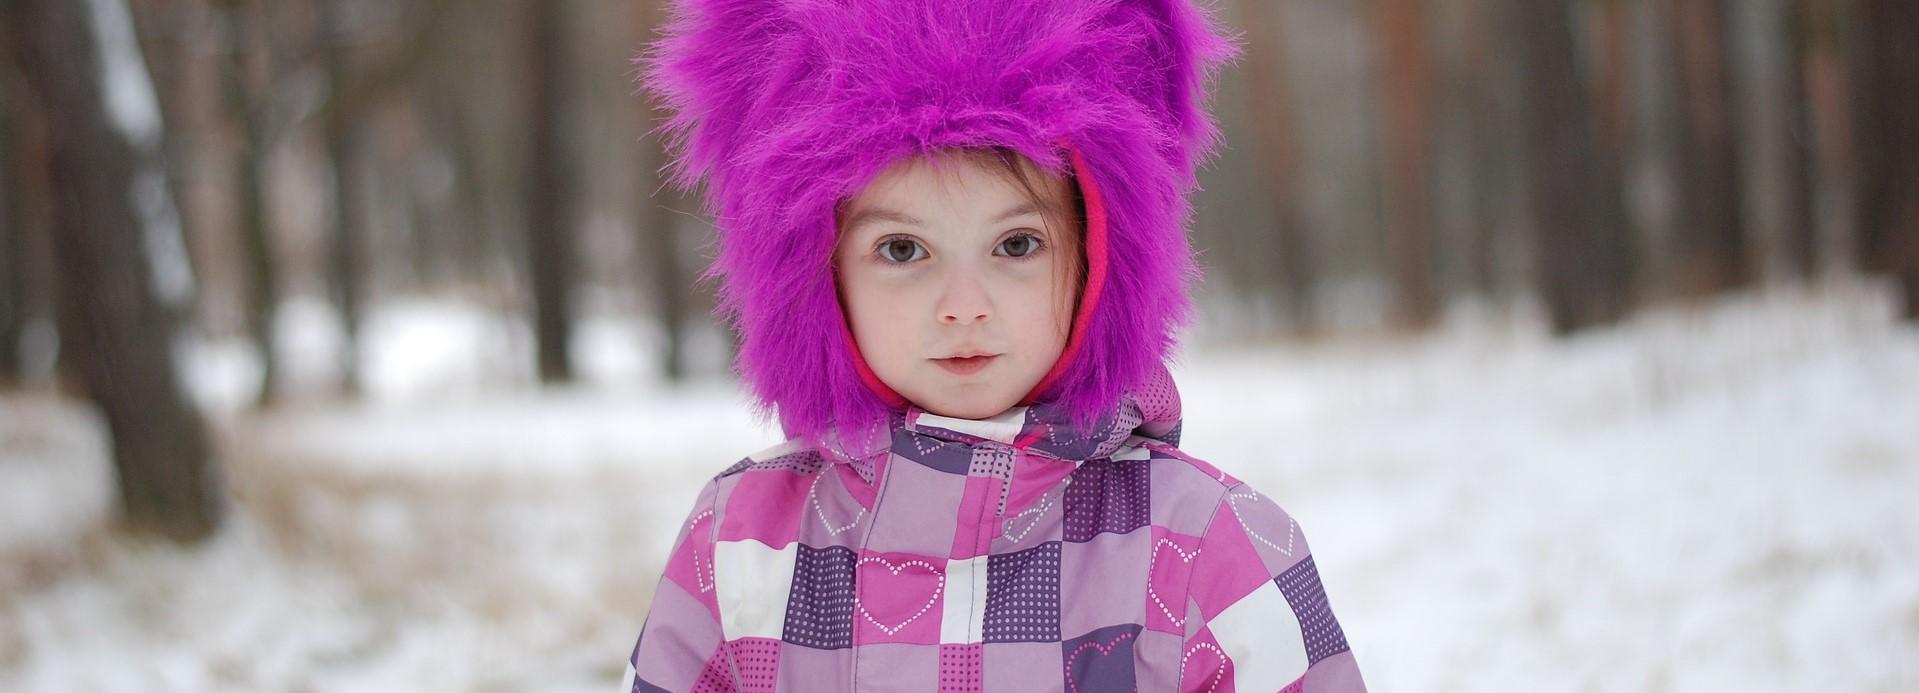 Little Girl on Winter | Kids Car Donations